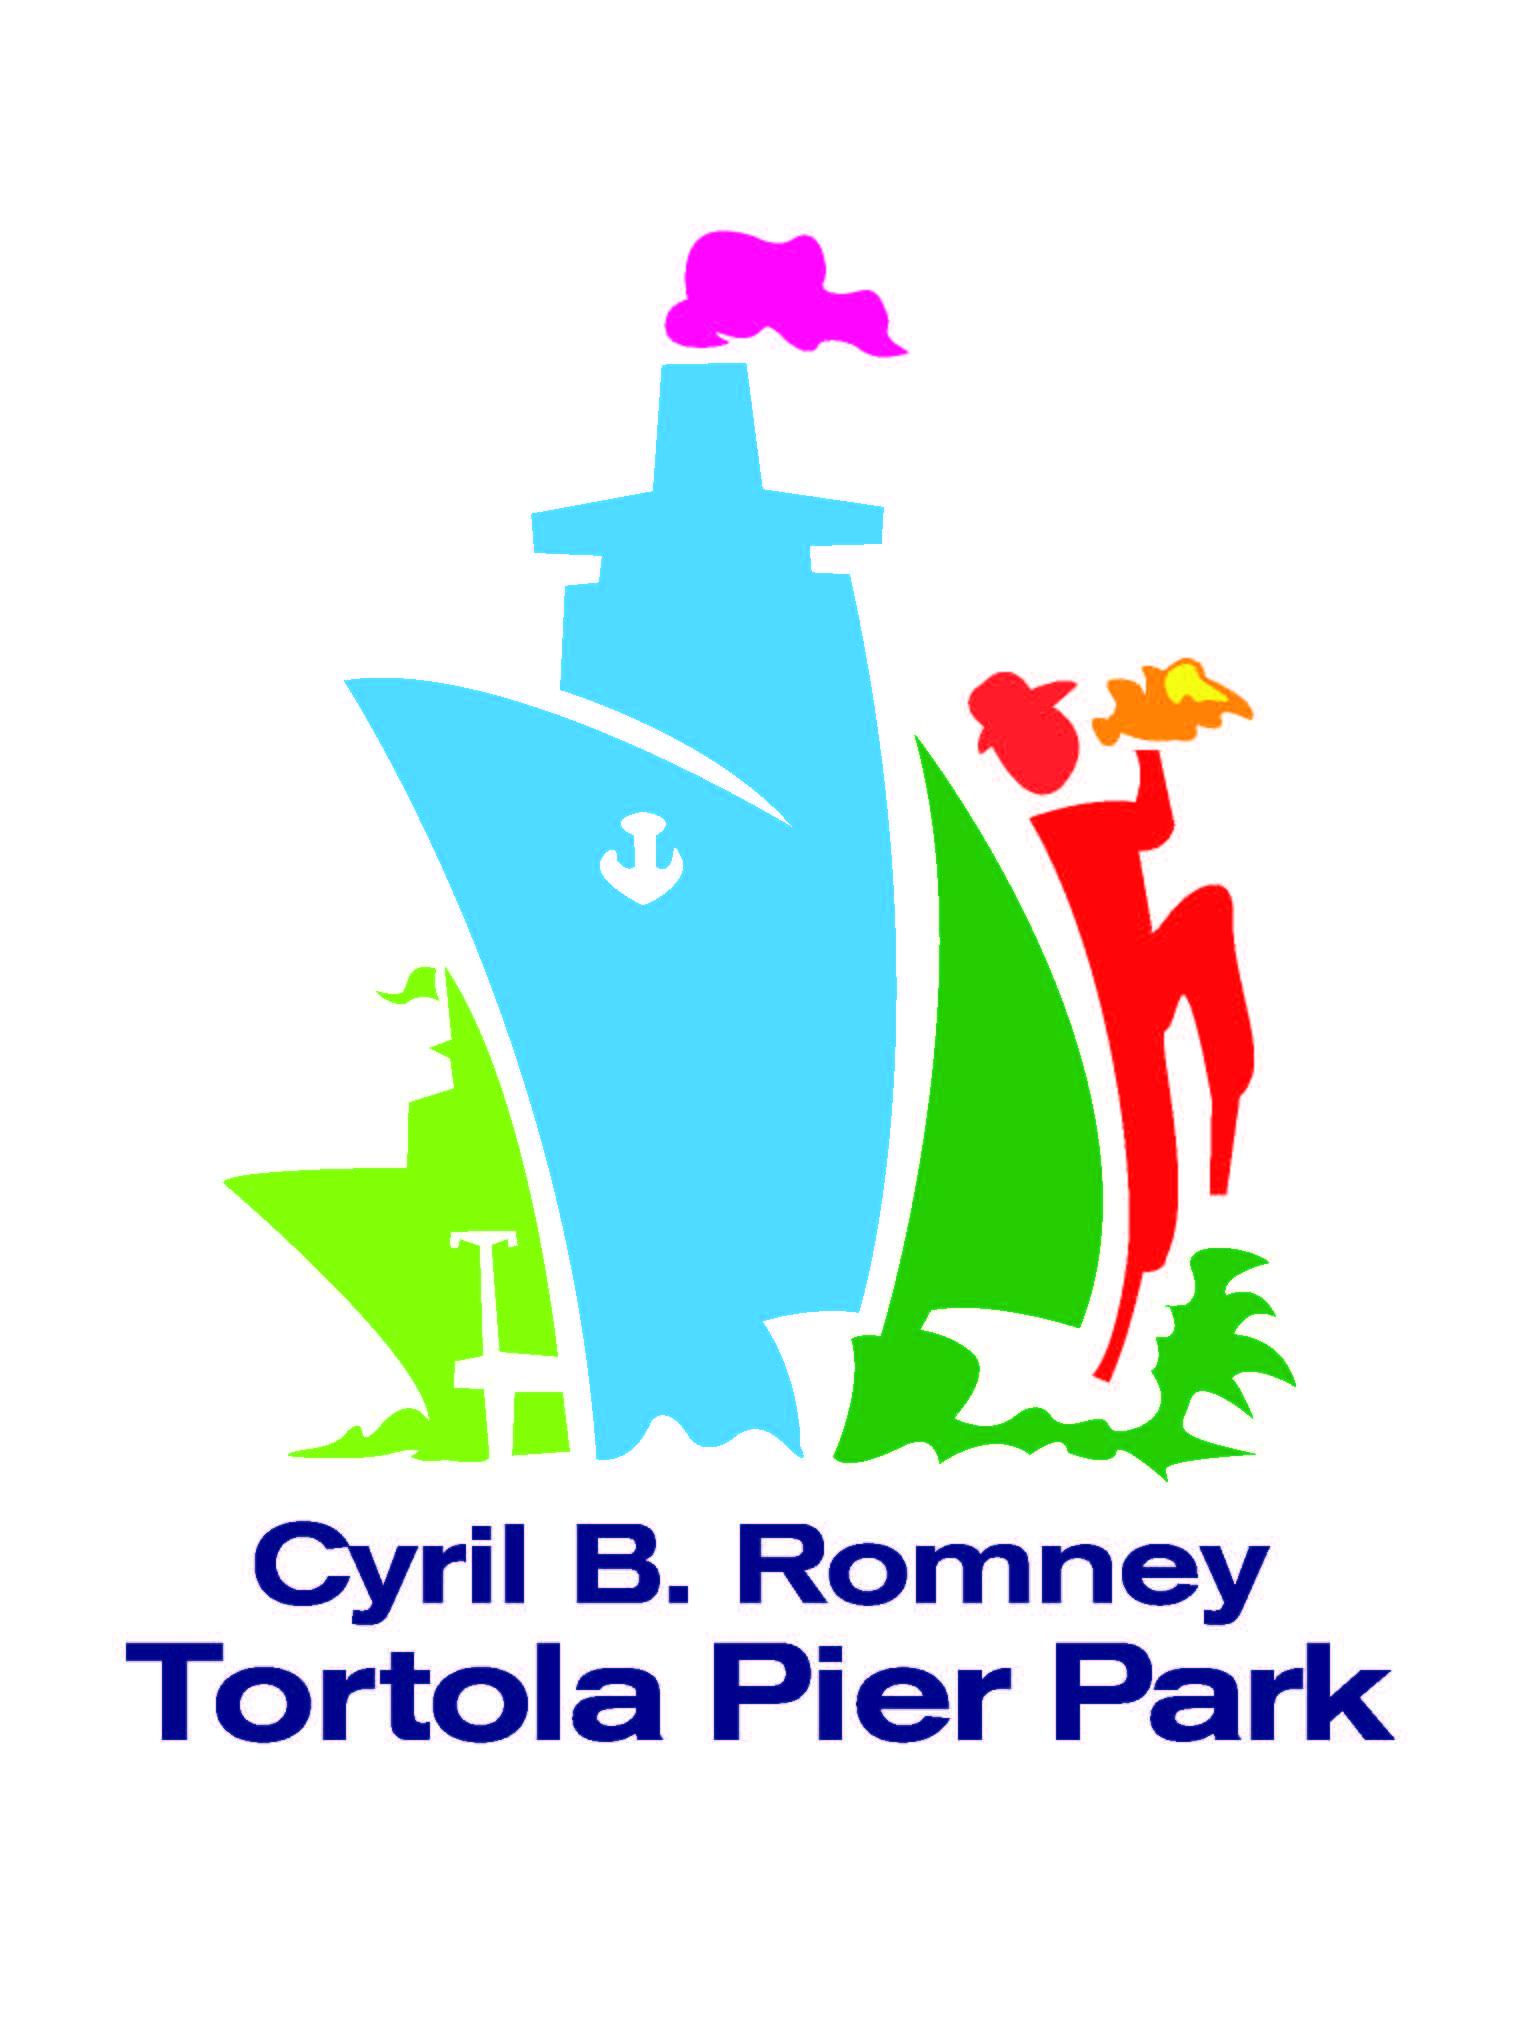 CBR Tortola Pier Park